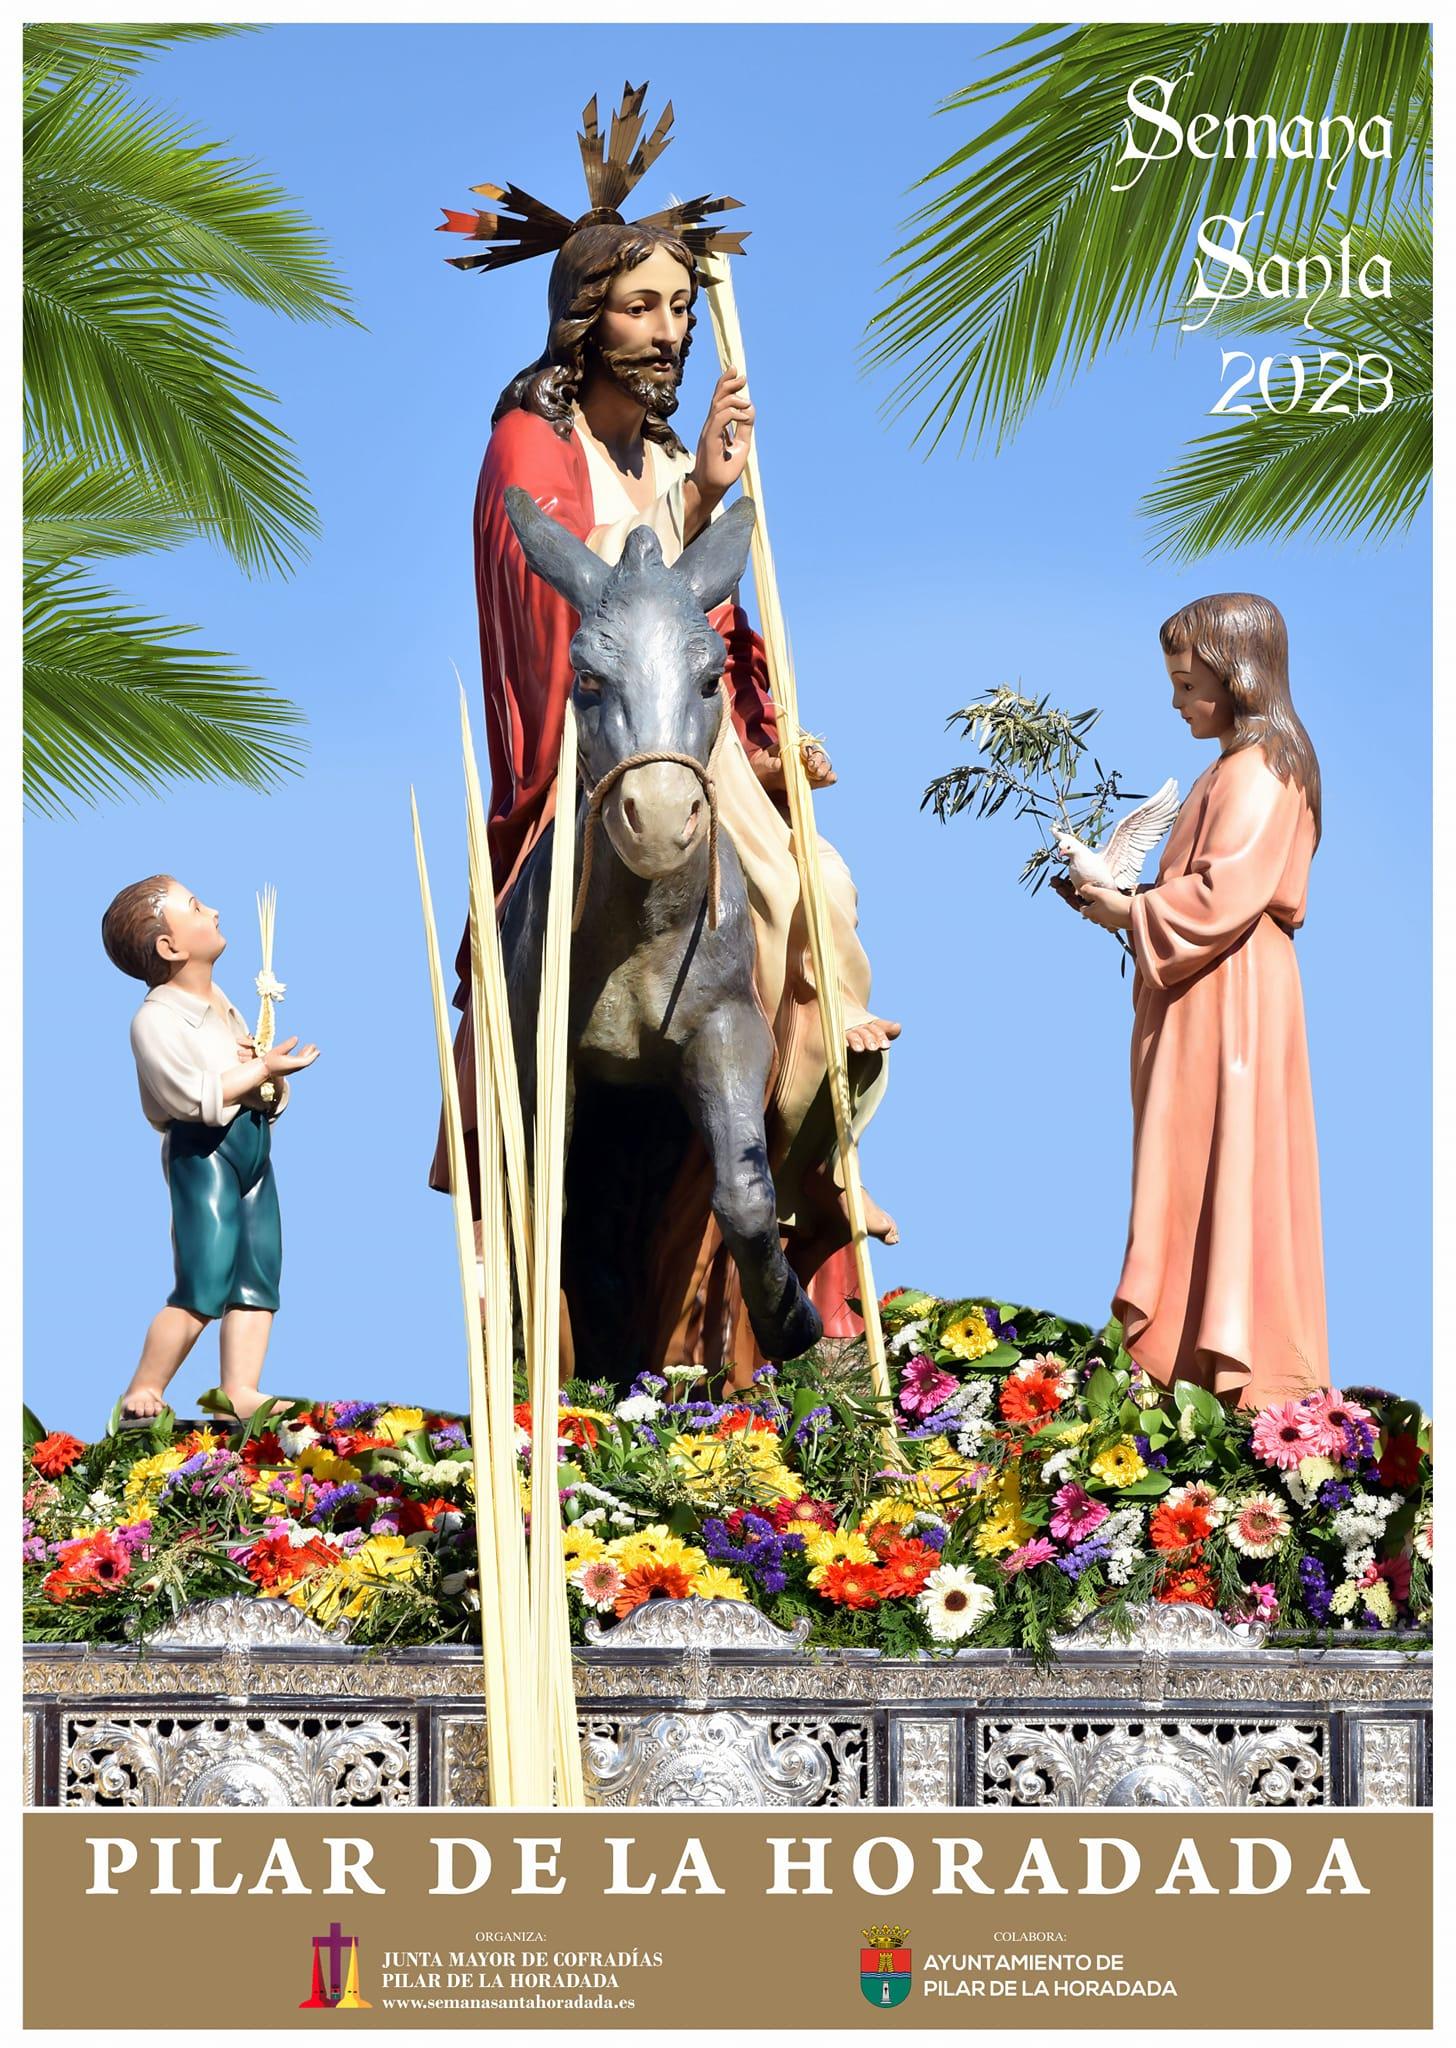 Semana Santa en Pilar de la Horadada Programa